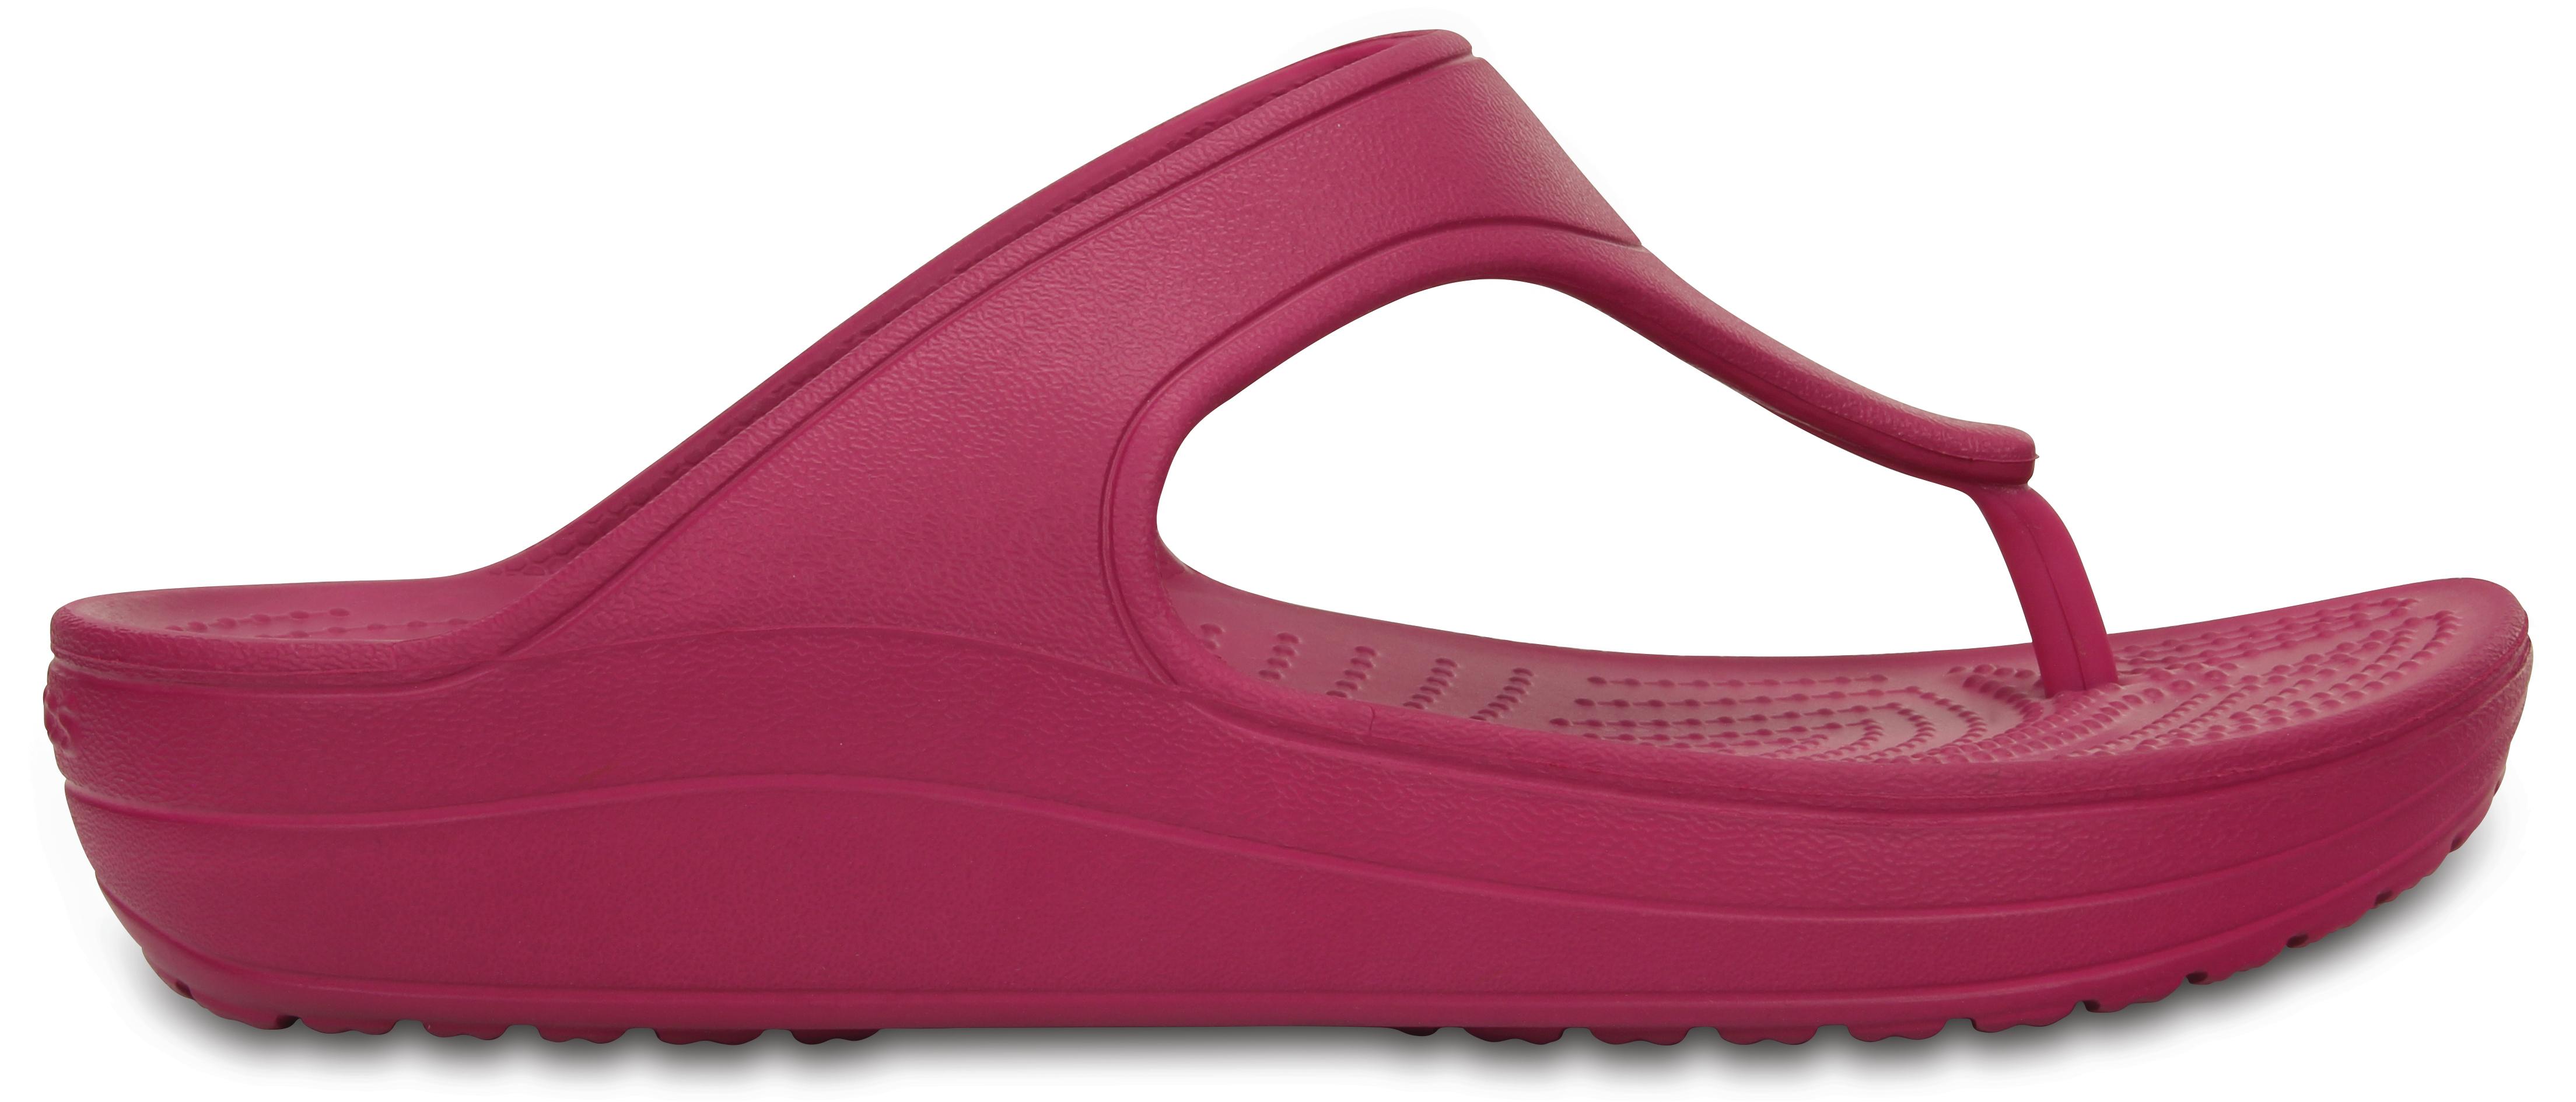 Crocs Crocs Sloane Platform Flip W - Berry W6 - vel.36 6b8bbdcfc0